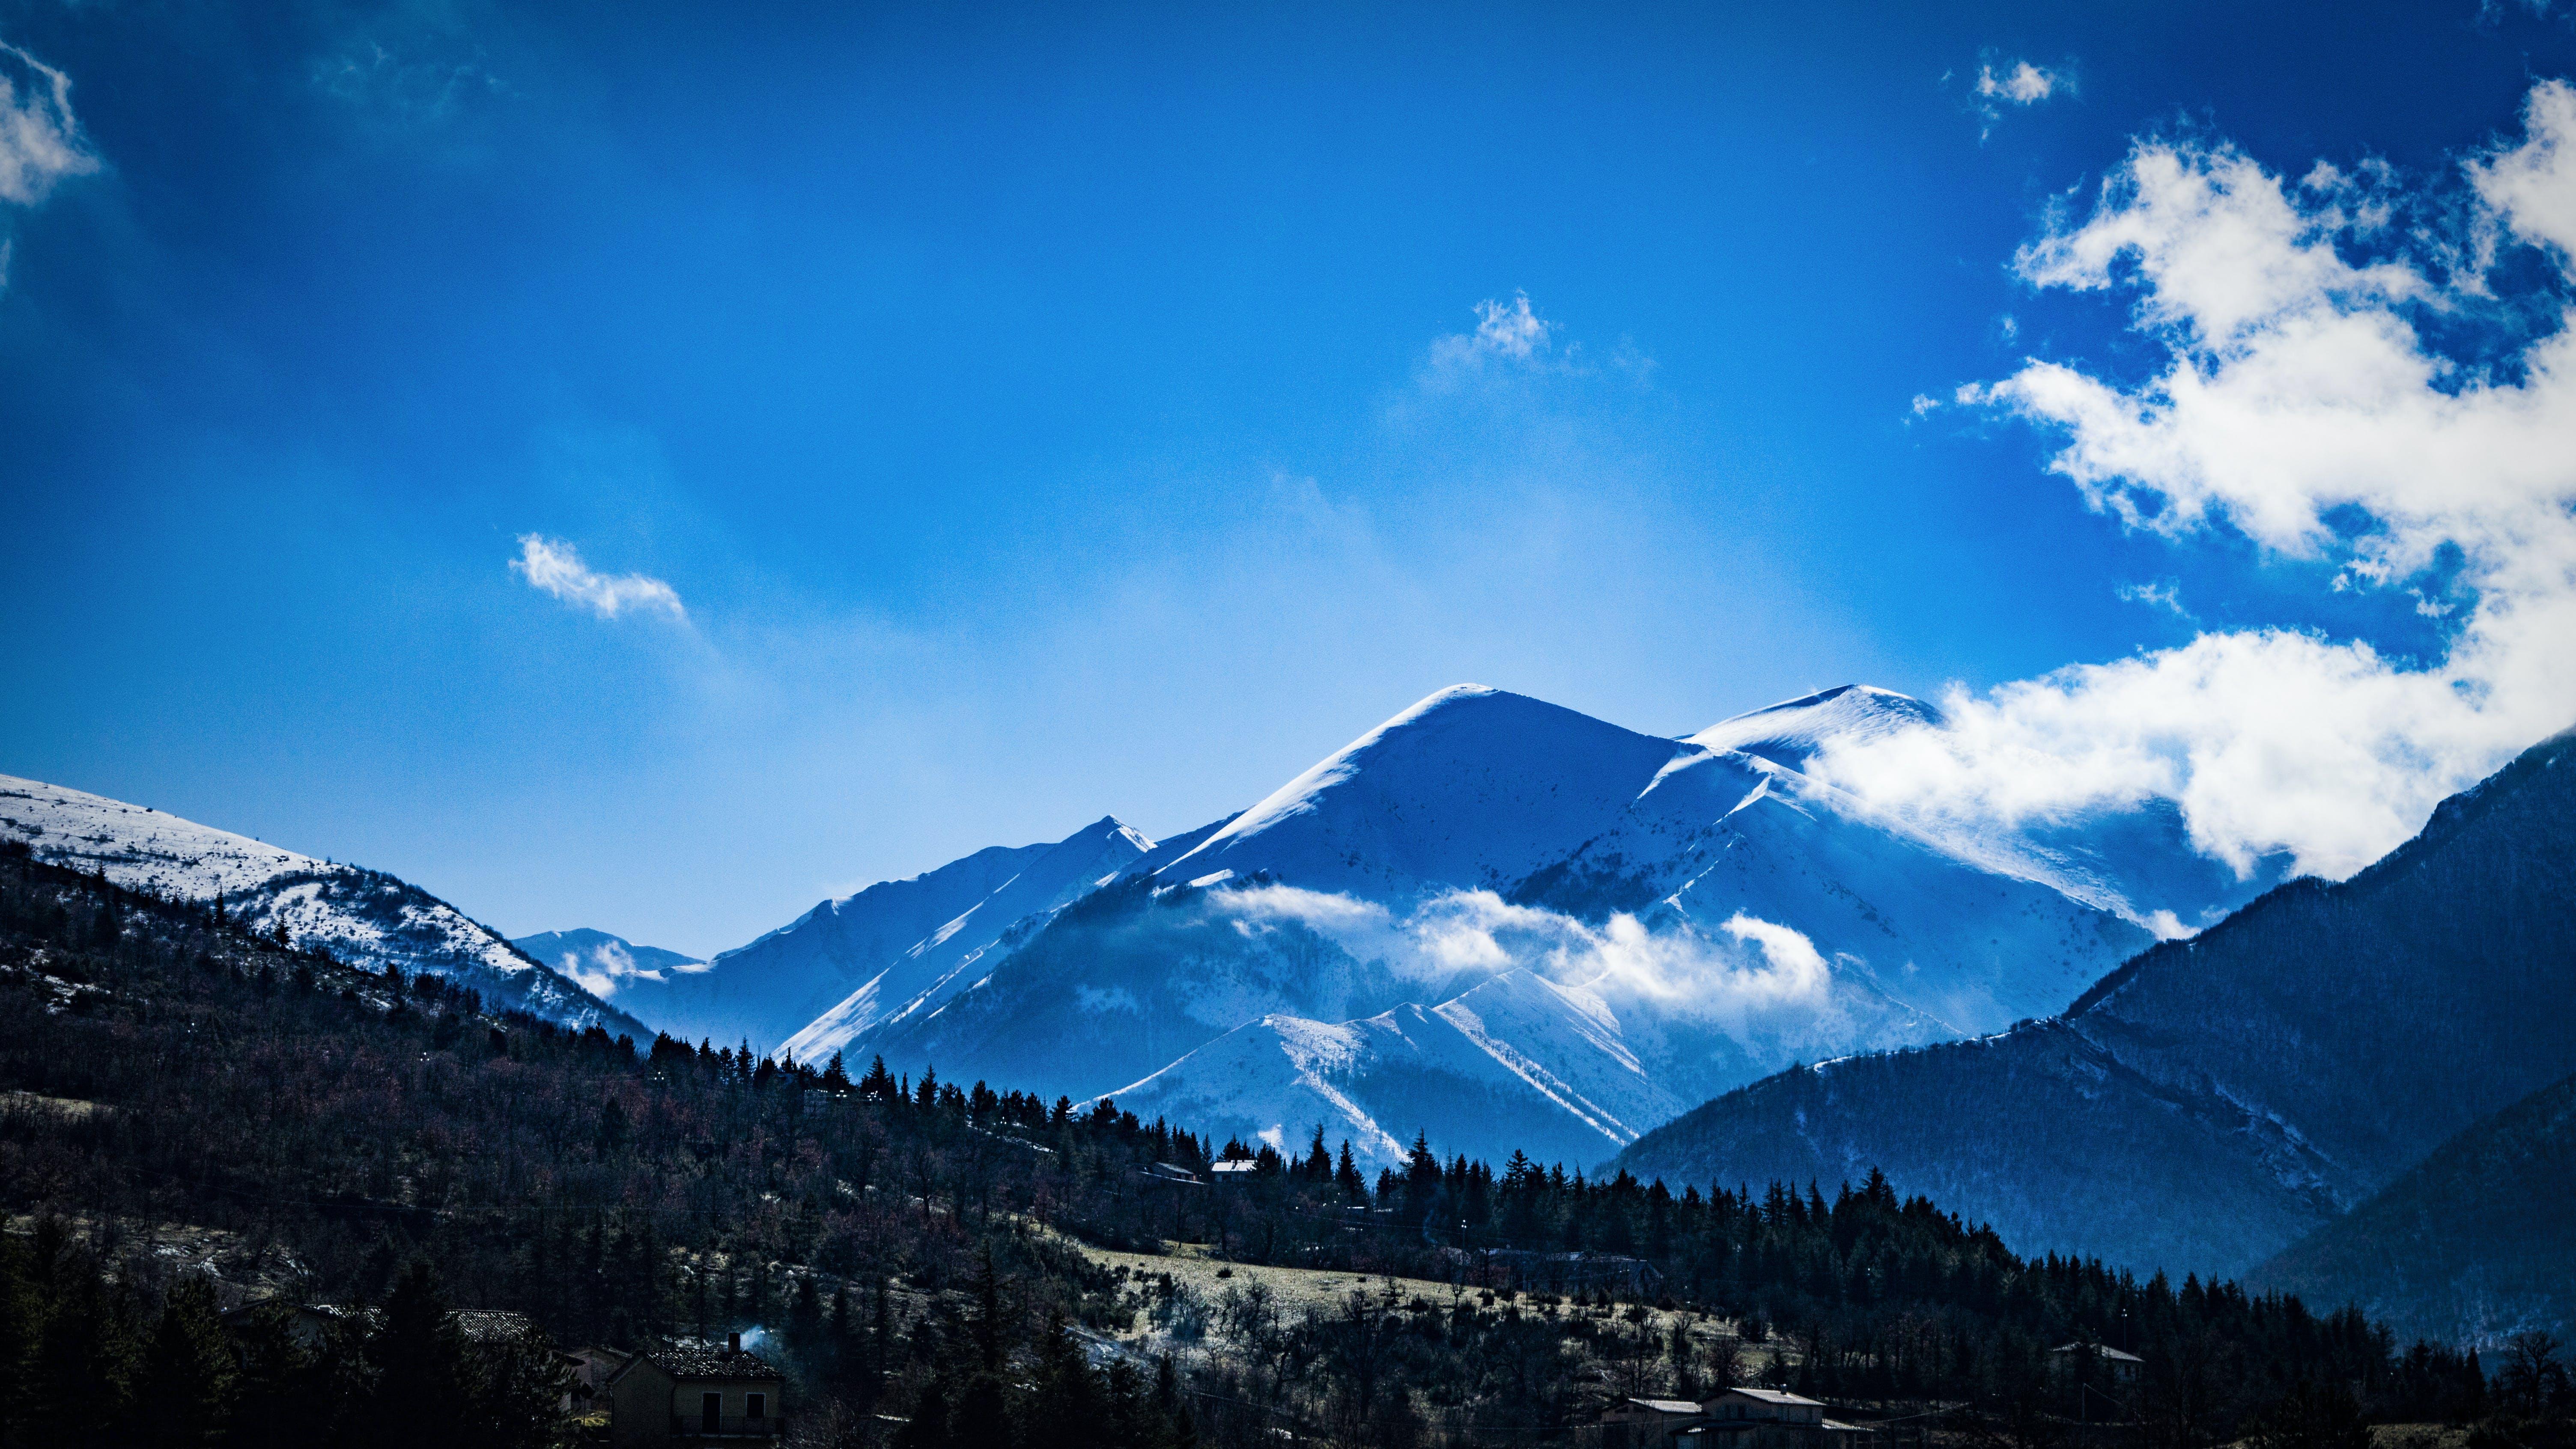 Photo of Trees on Mountains